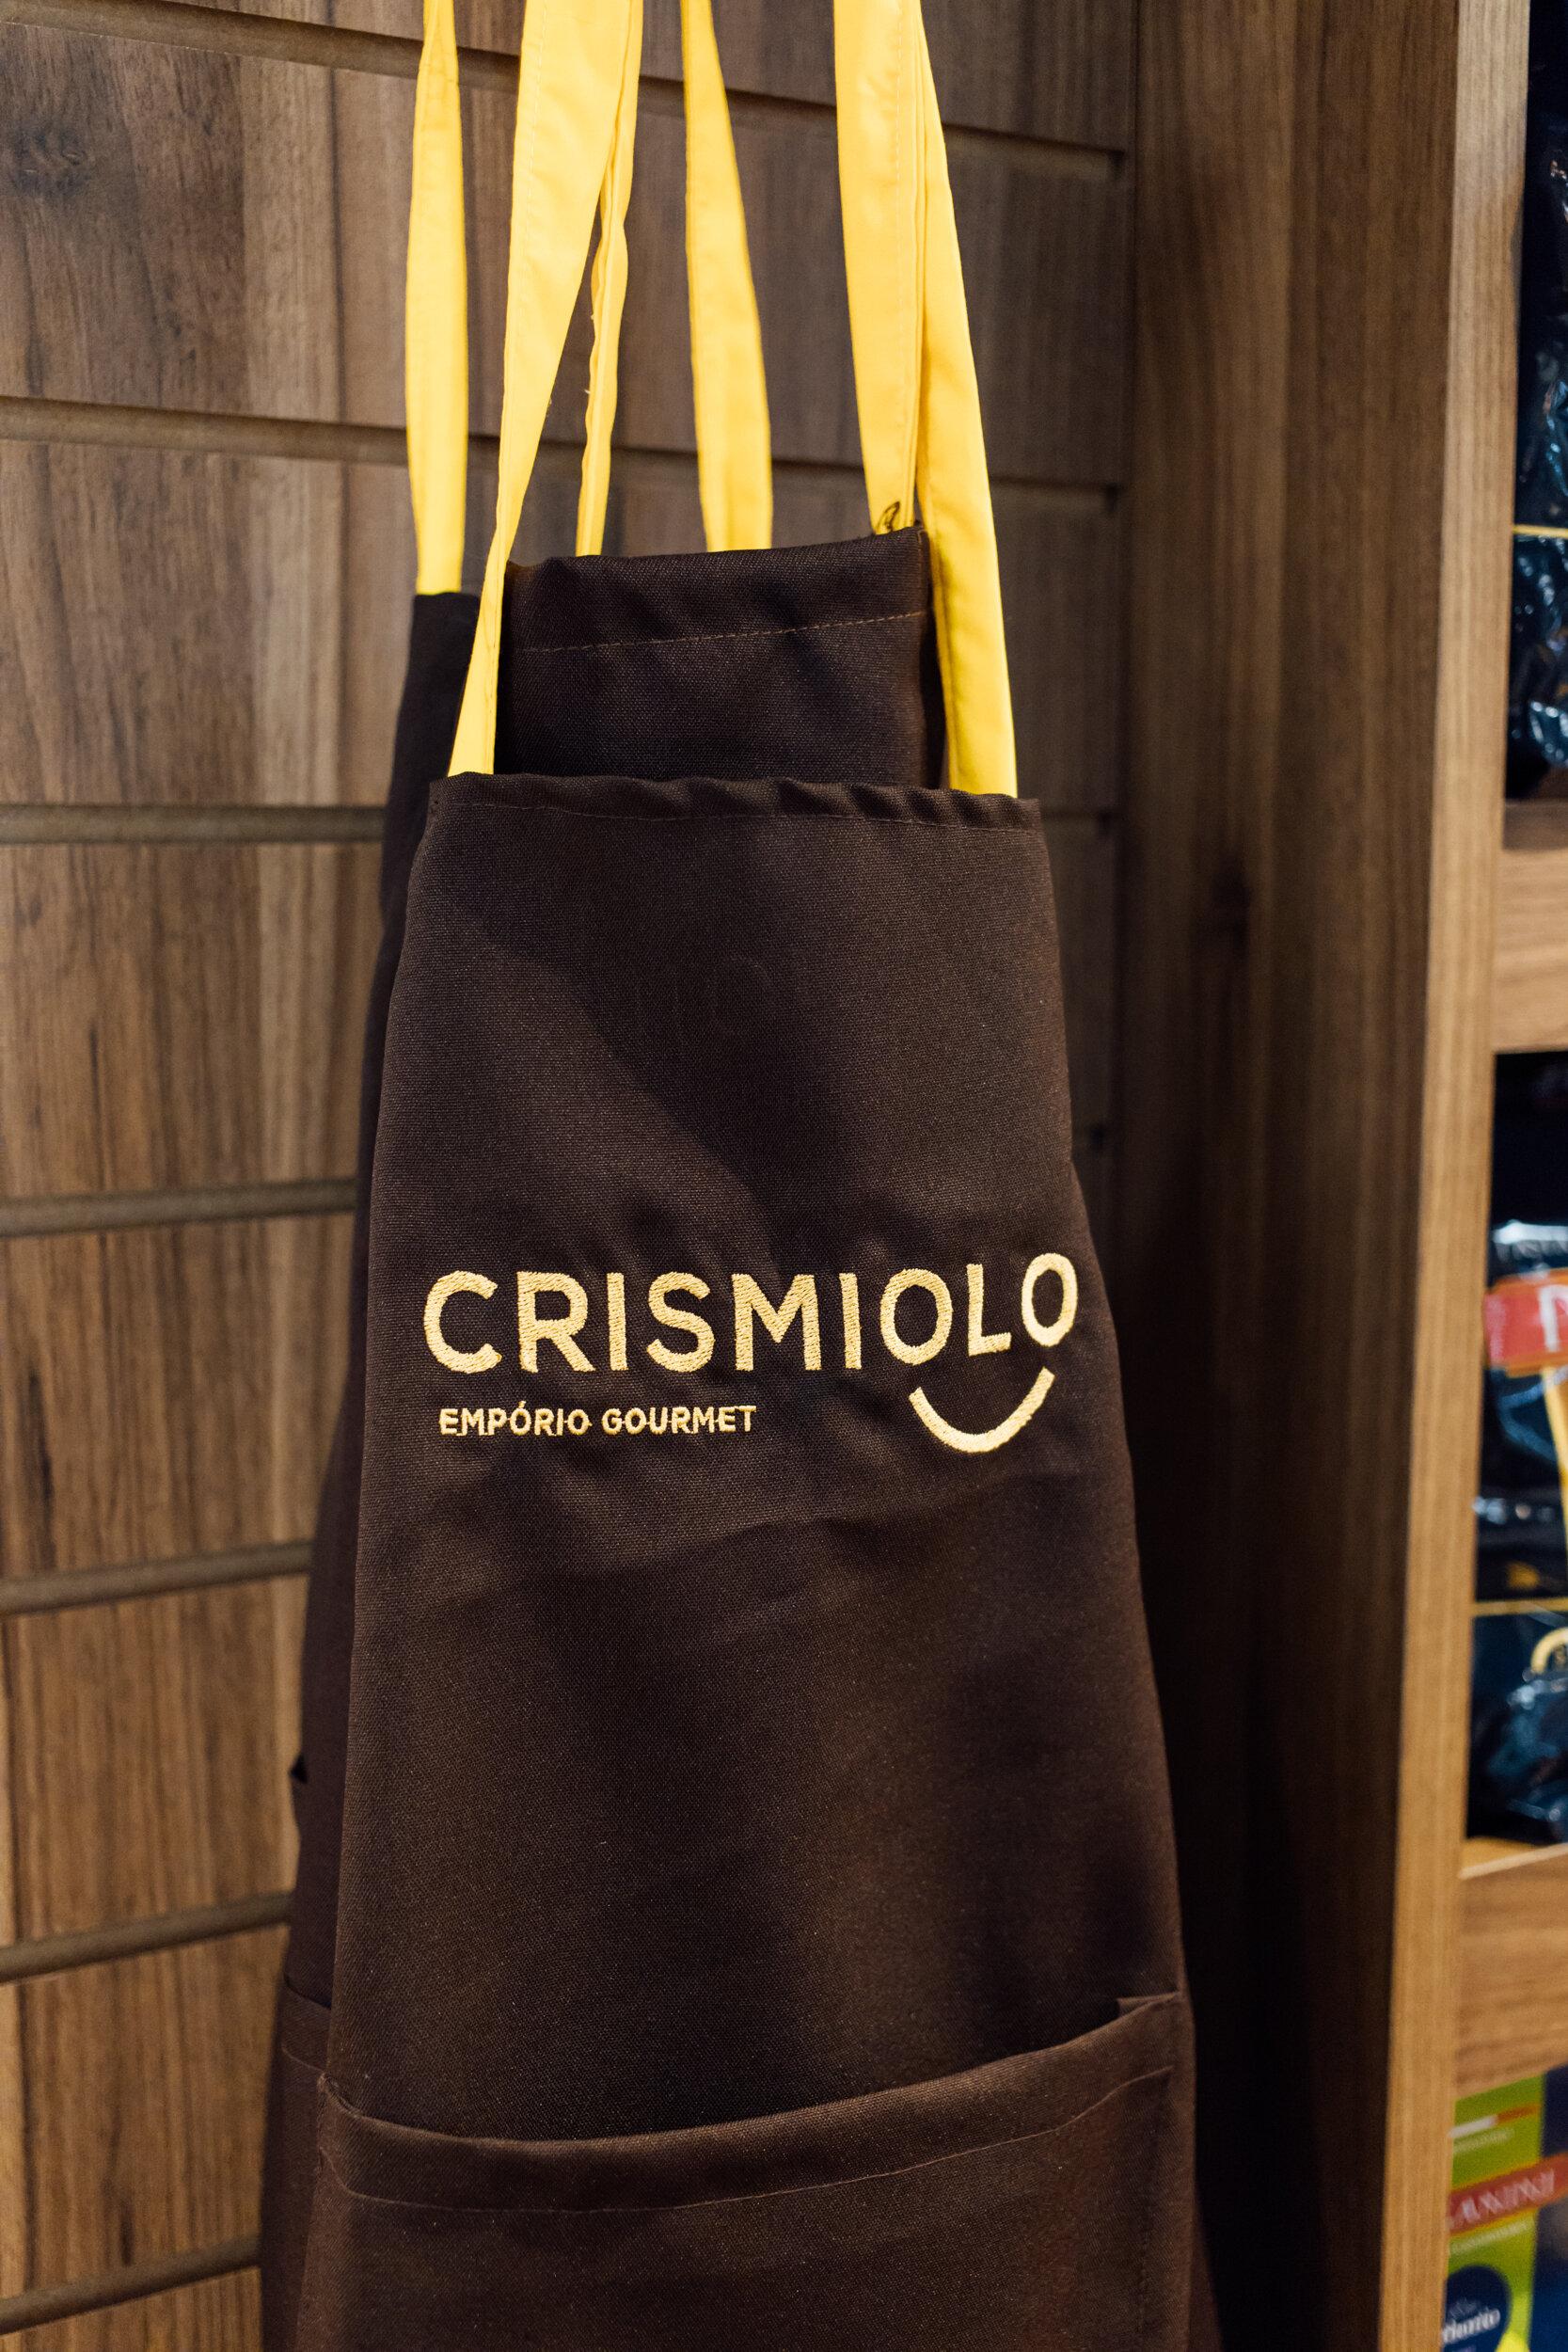 Crismiolo Empório Gourmet Bento Gonçalves